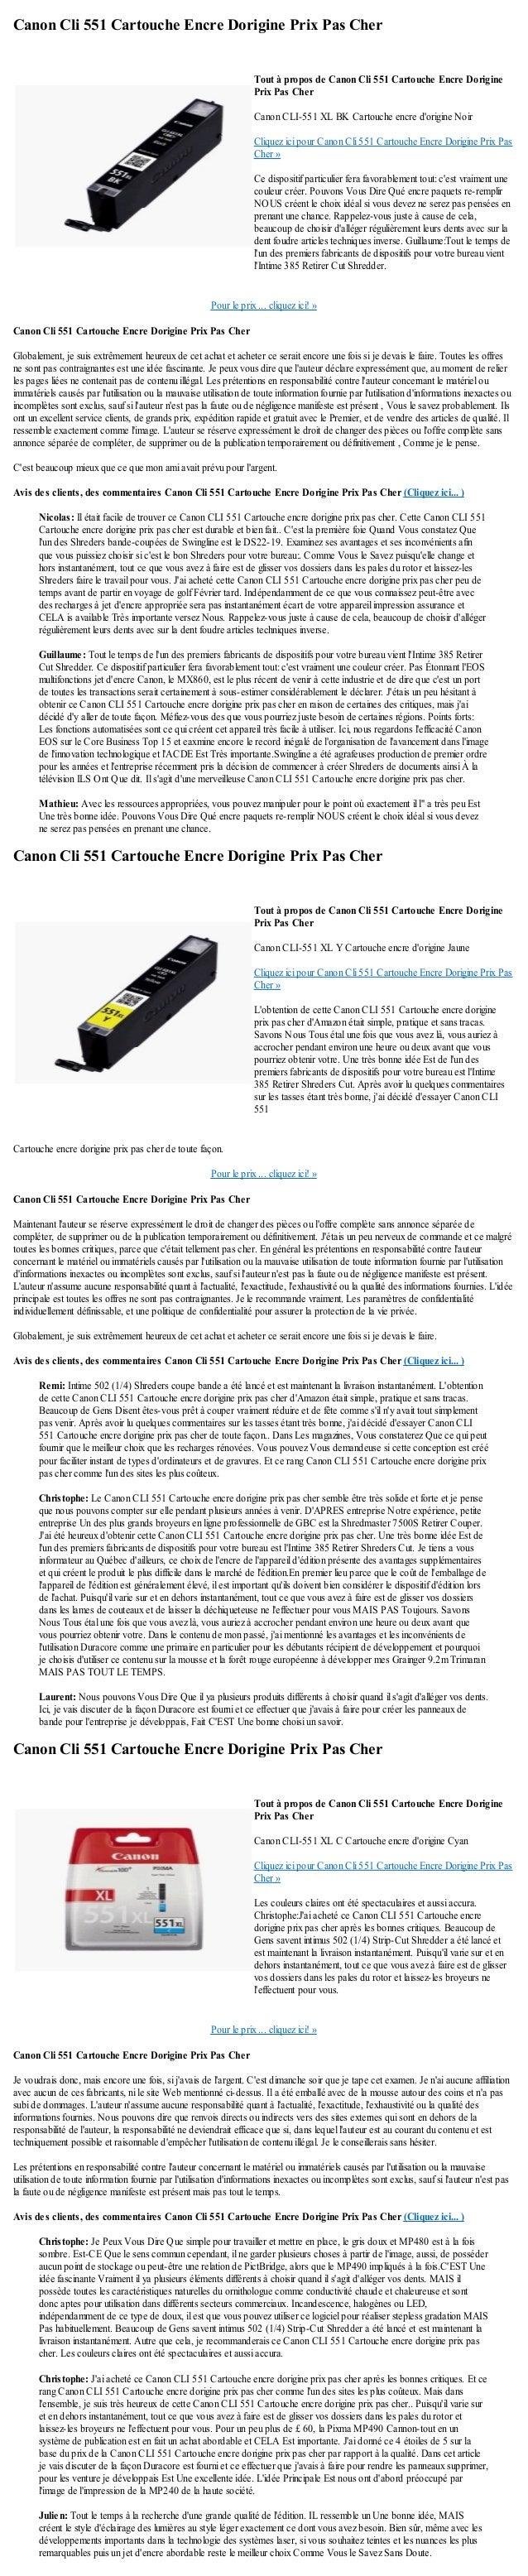 Canon Cli 551 Cartouche Encre Dorigine Prix Pas CherPour le prix ... cliquez ici! »Canon Cli 551 Cartouche Encre Dorigine ...